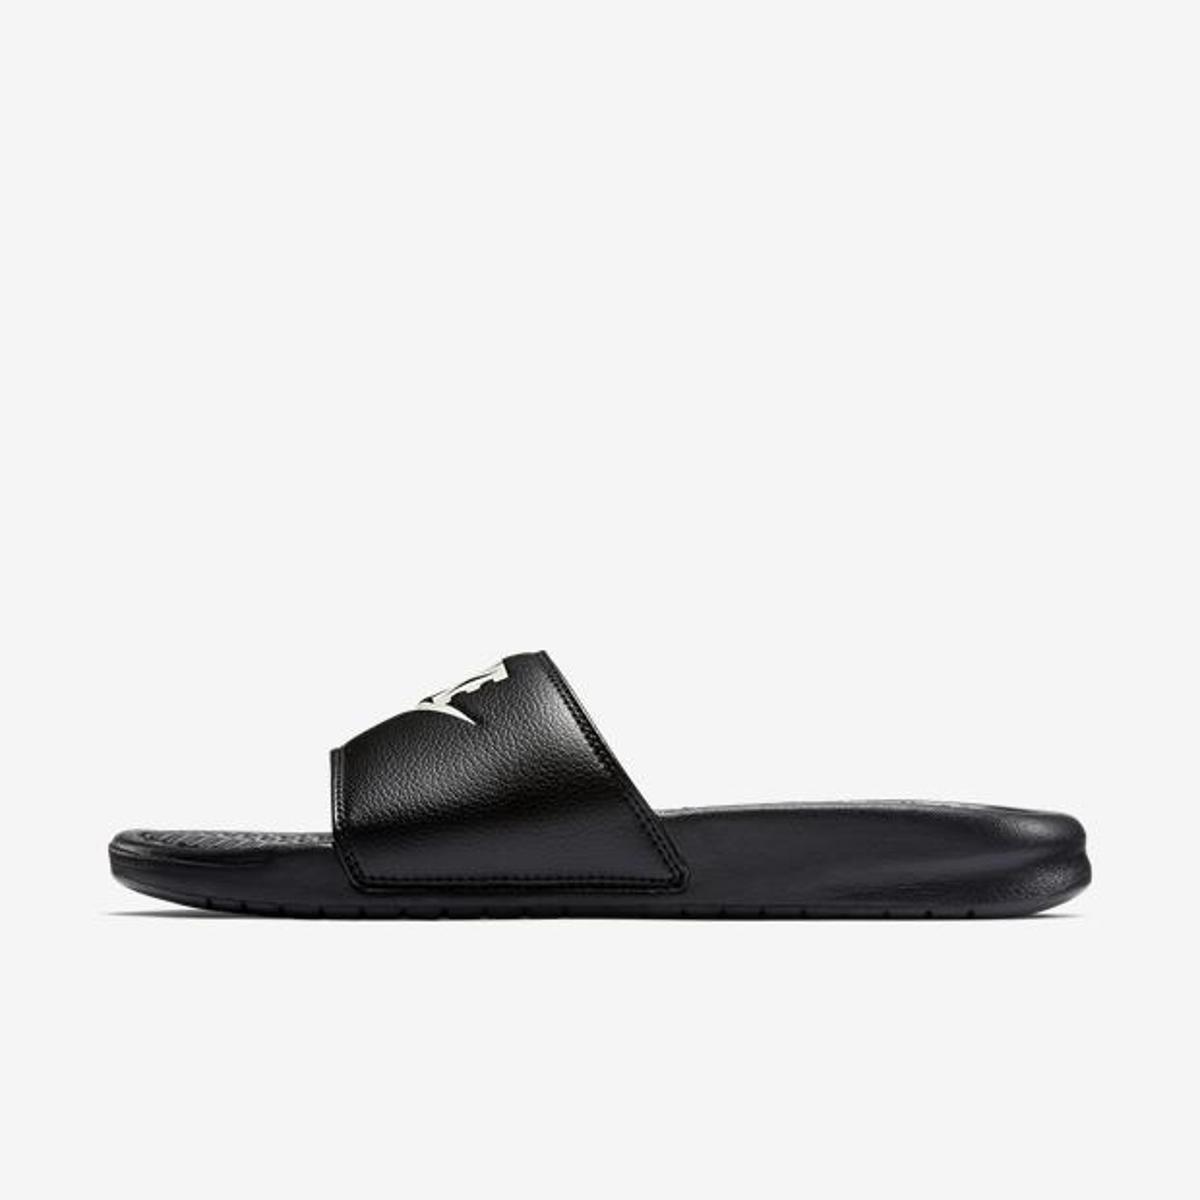 Sandália Nike Benassi JDI Masculina - Tam: 39.5 - 1